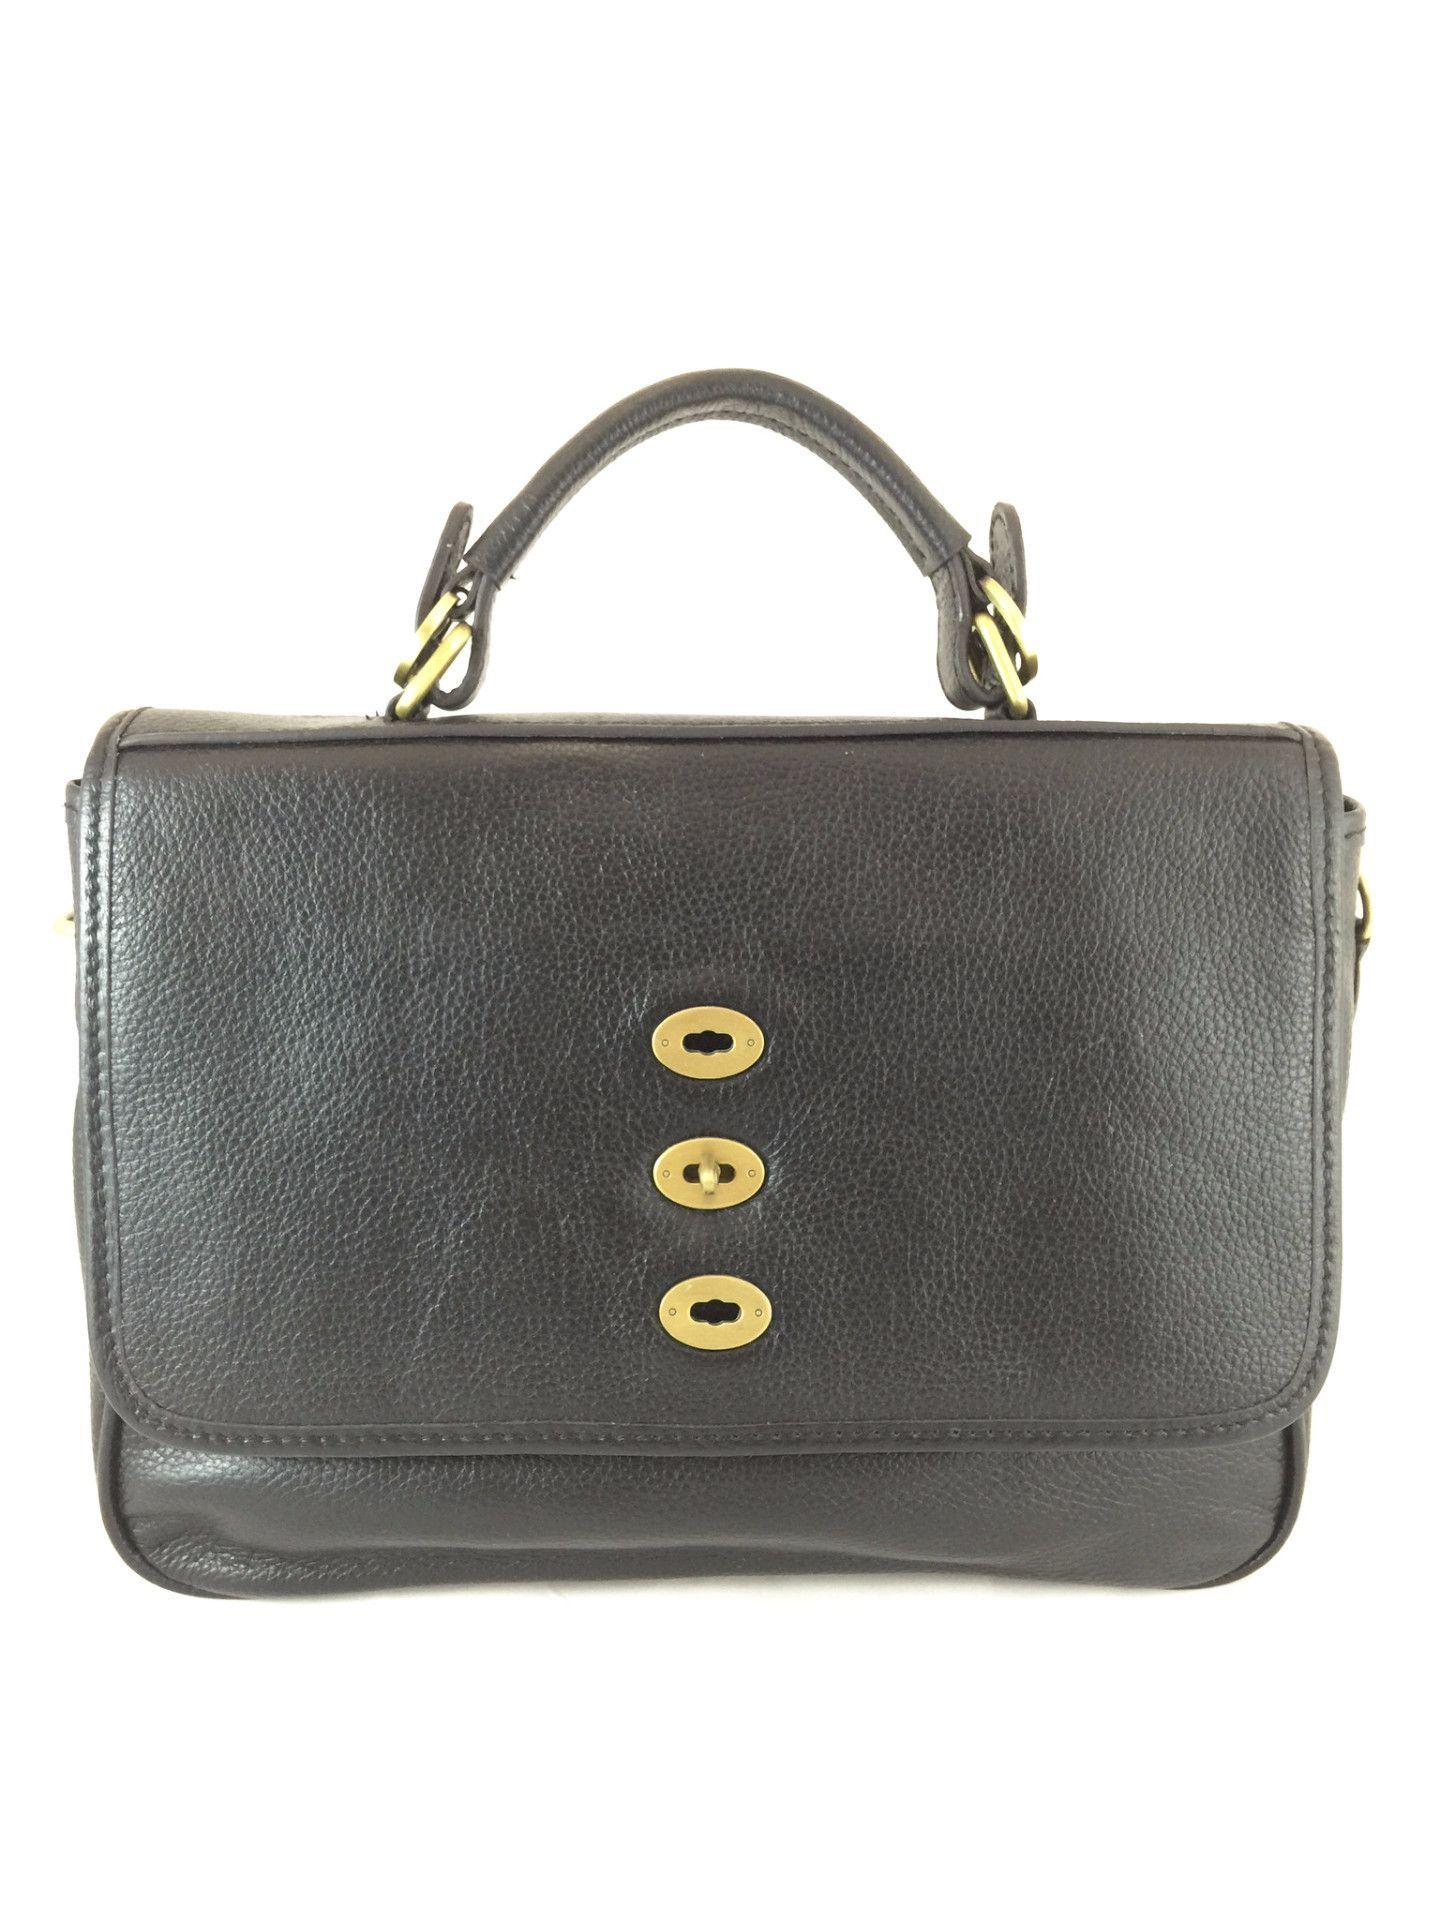 A5025 Pebble Embossed Genuine Leather Turn Lock Cross Body Satchel Handbag Clearance